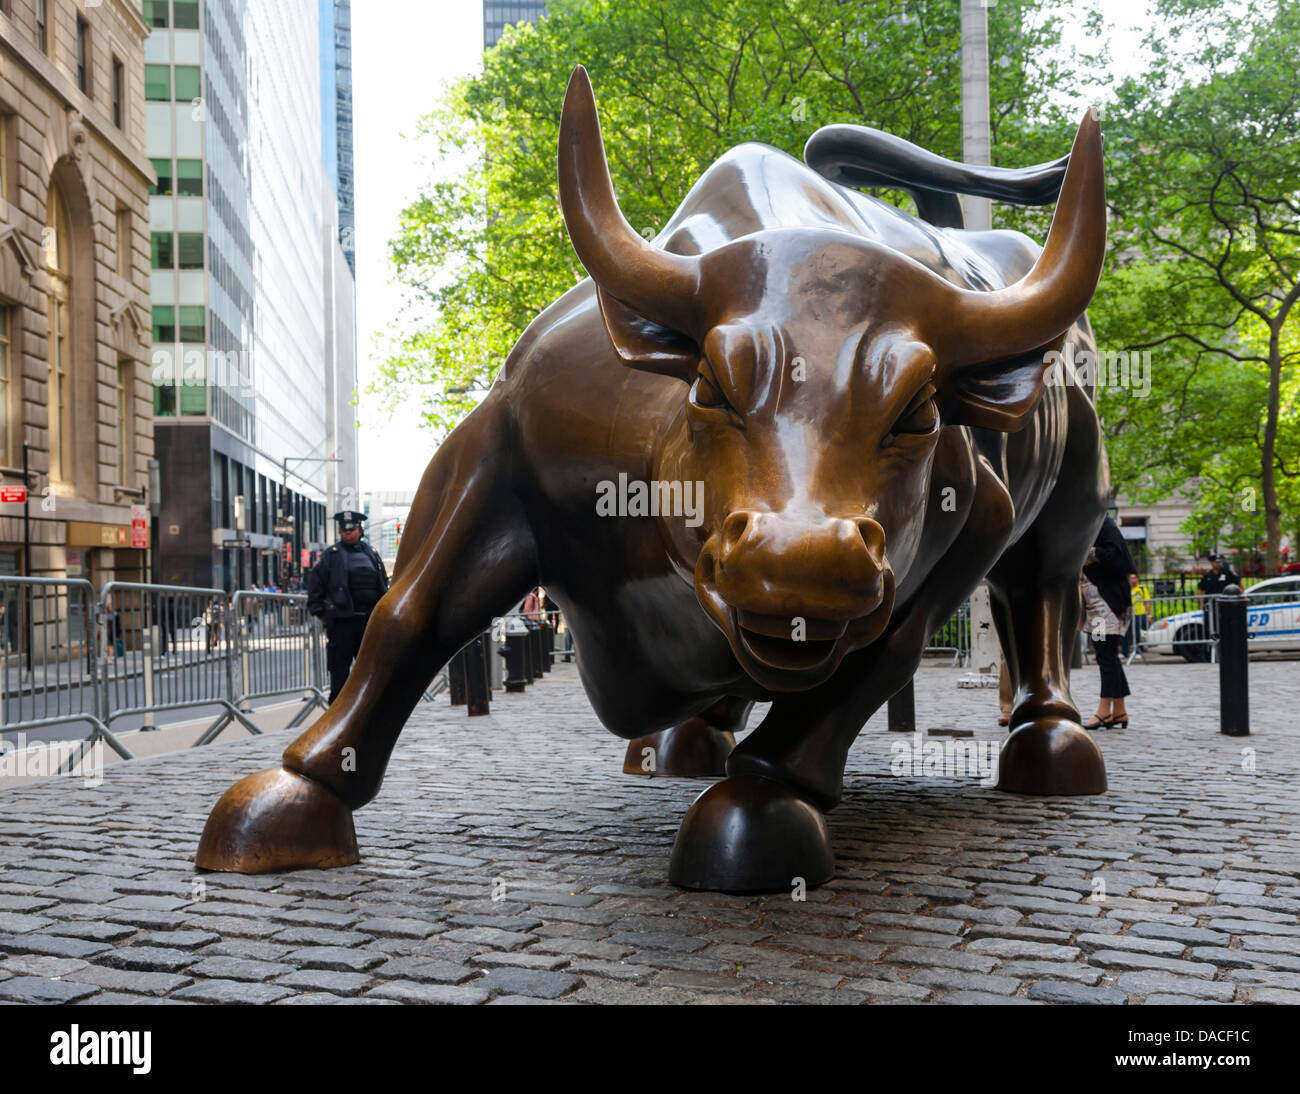 Bull charge par Arturo di Modica (Wall Street Bull), Manhattan, New York, USA Photo Stock